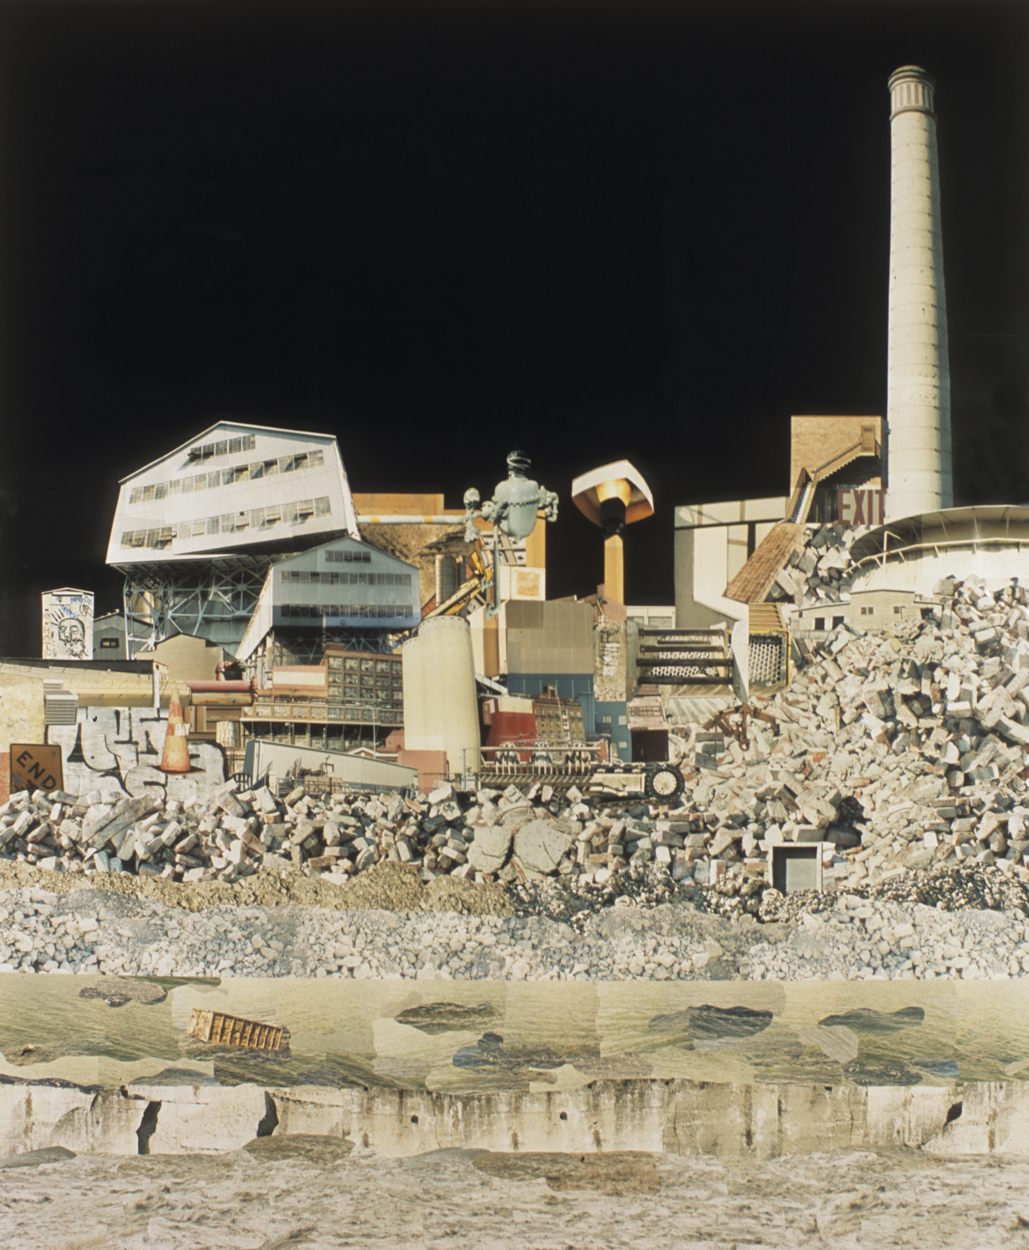 "A Dark Place . C-Print Collage, 72 x 60"", 2006."